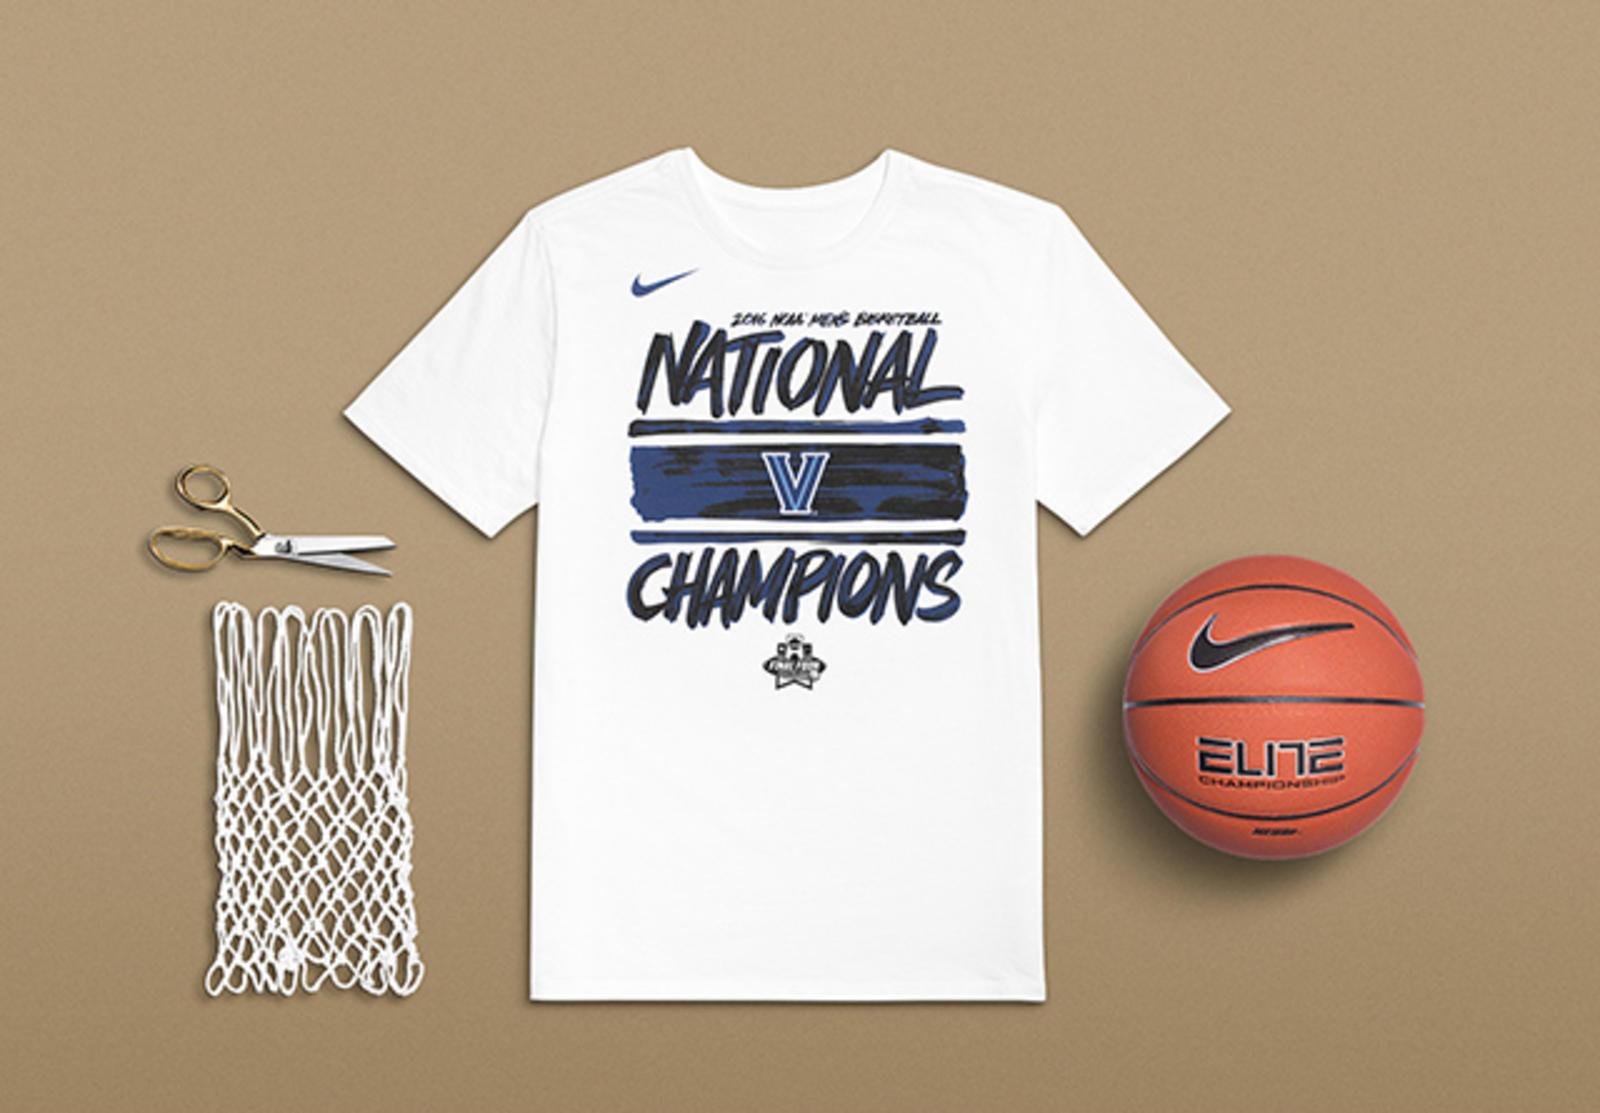 Nike Villanova National Championship T-shirt